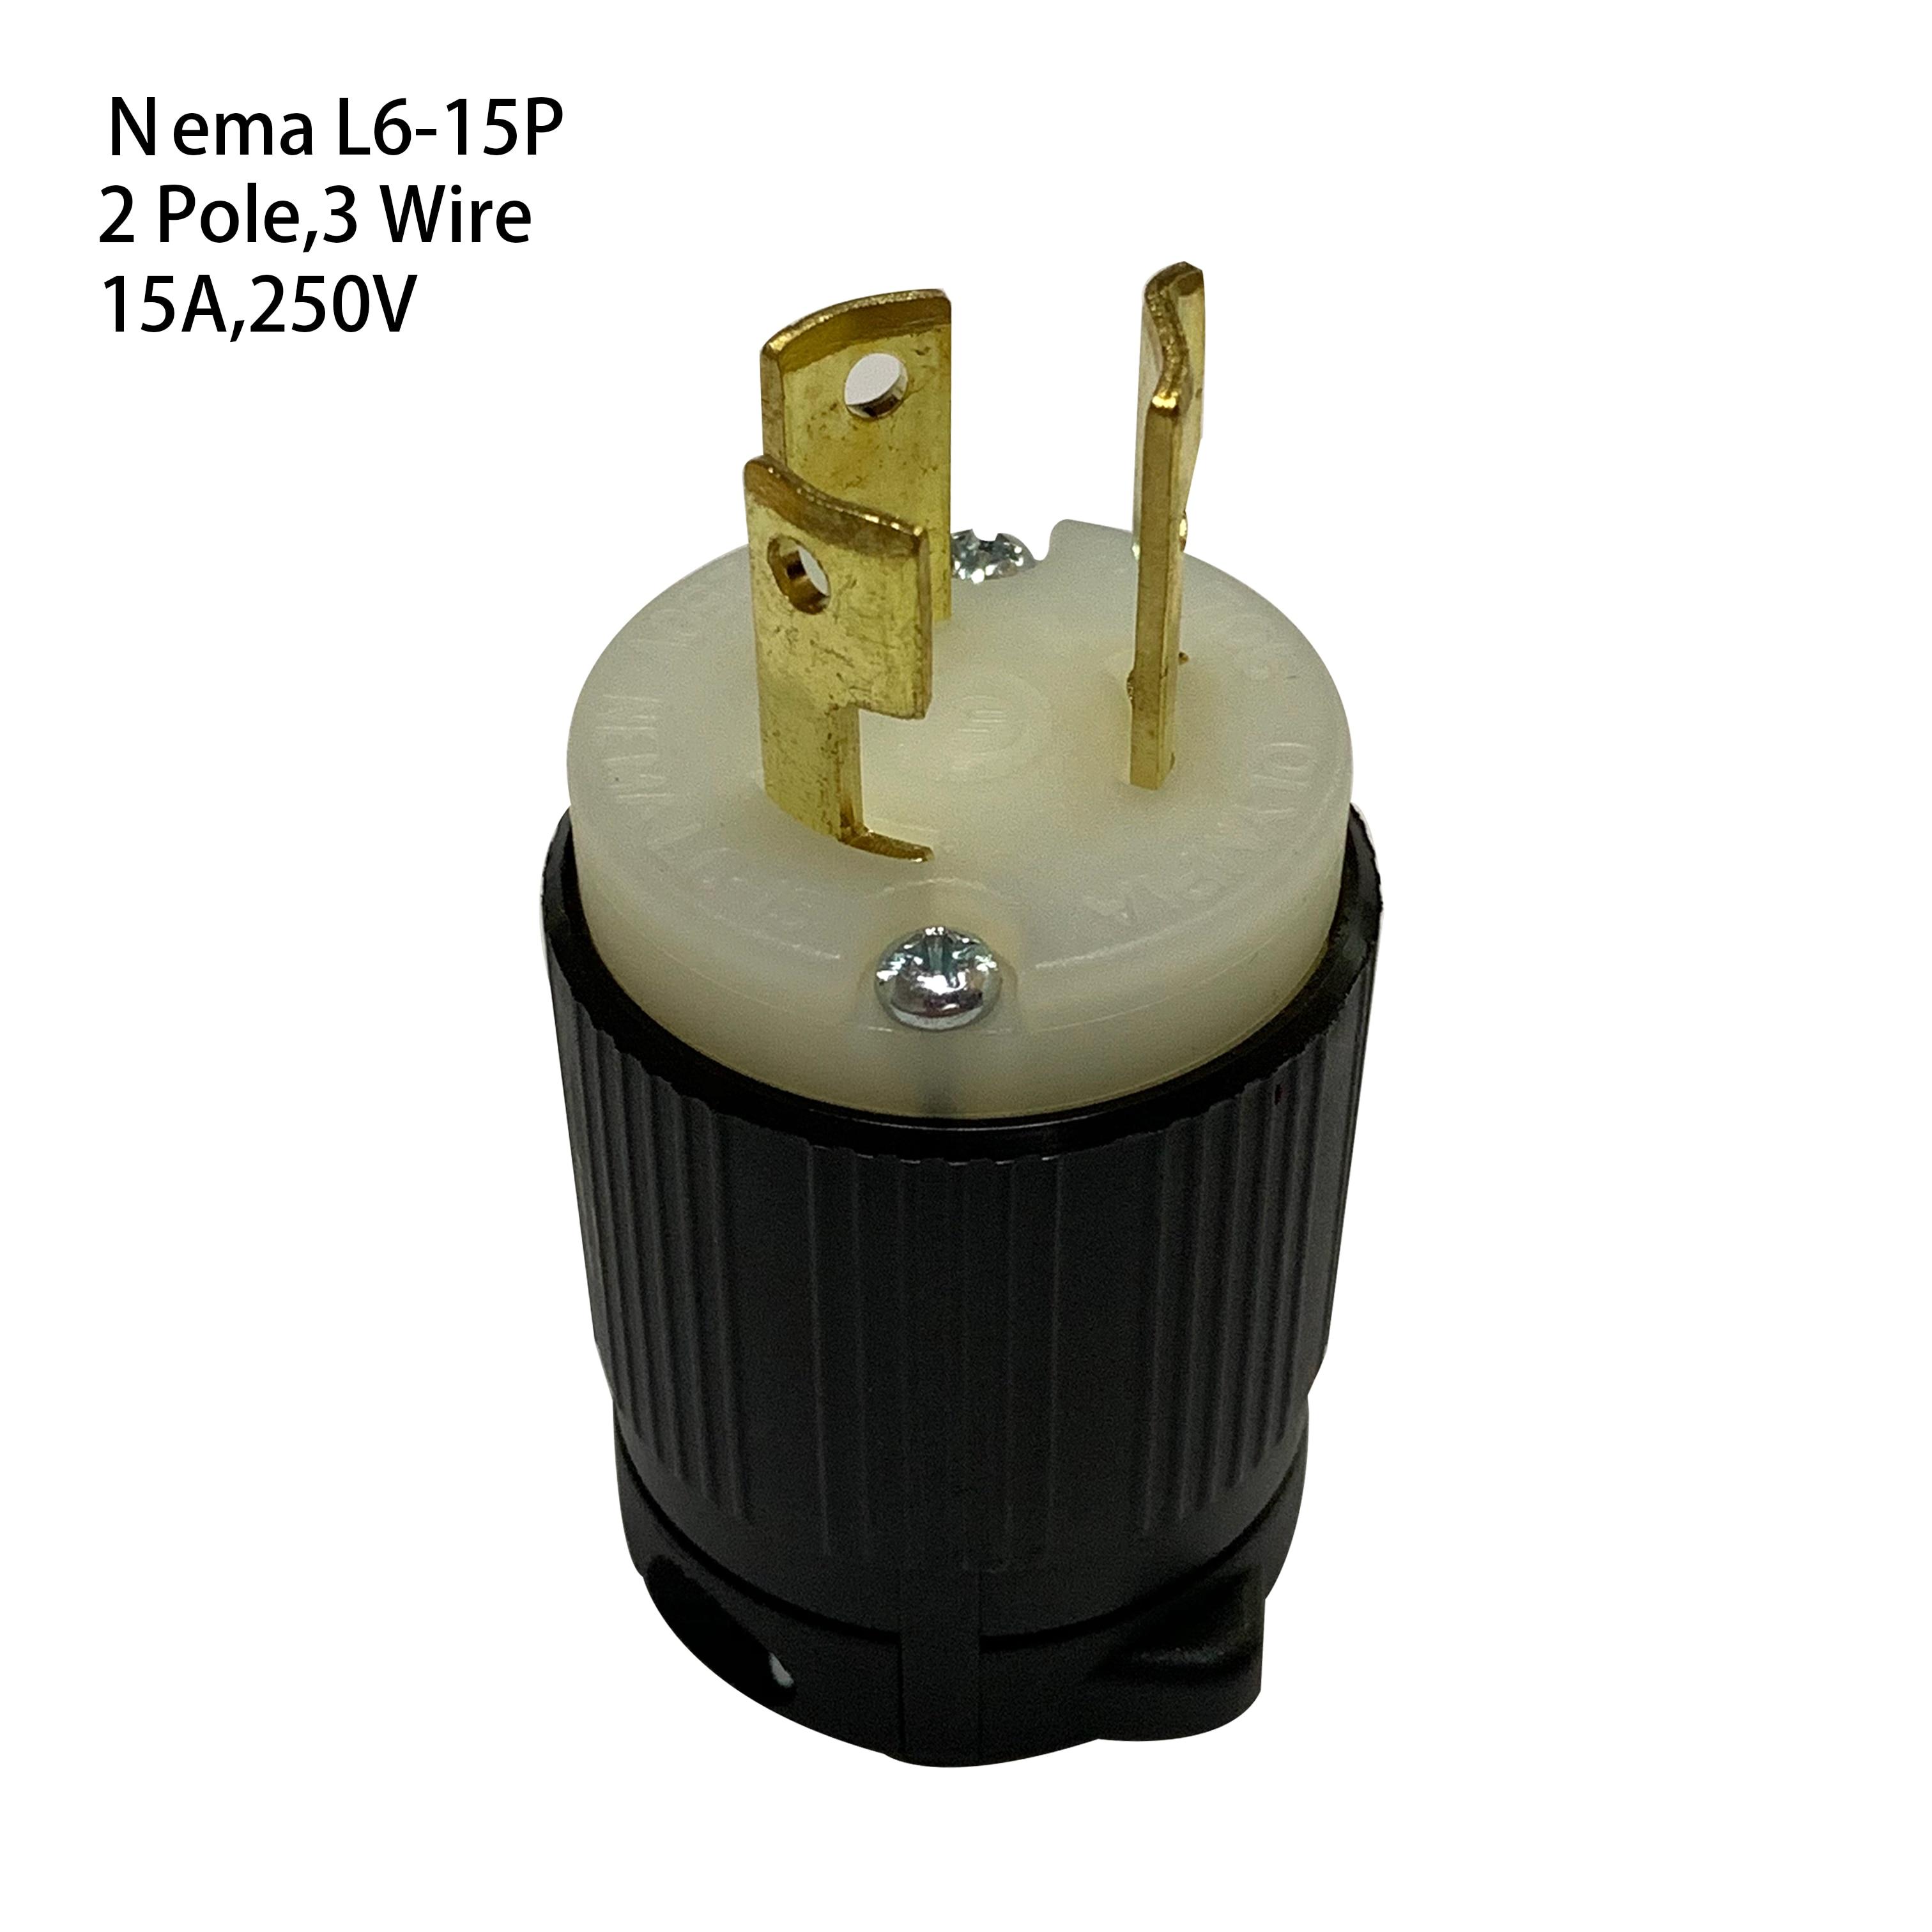 2 Pole 3 Wire Grounding 15A 250VAC Locking Plug Male NEMA L6-15P